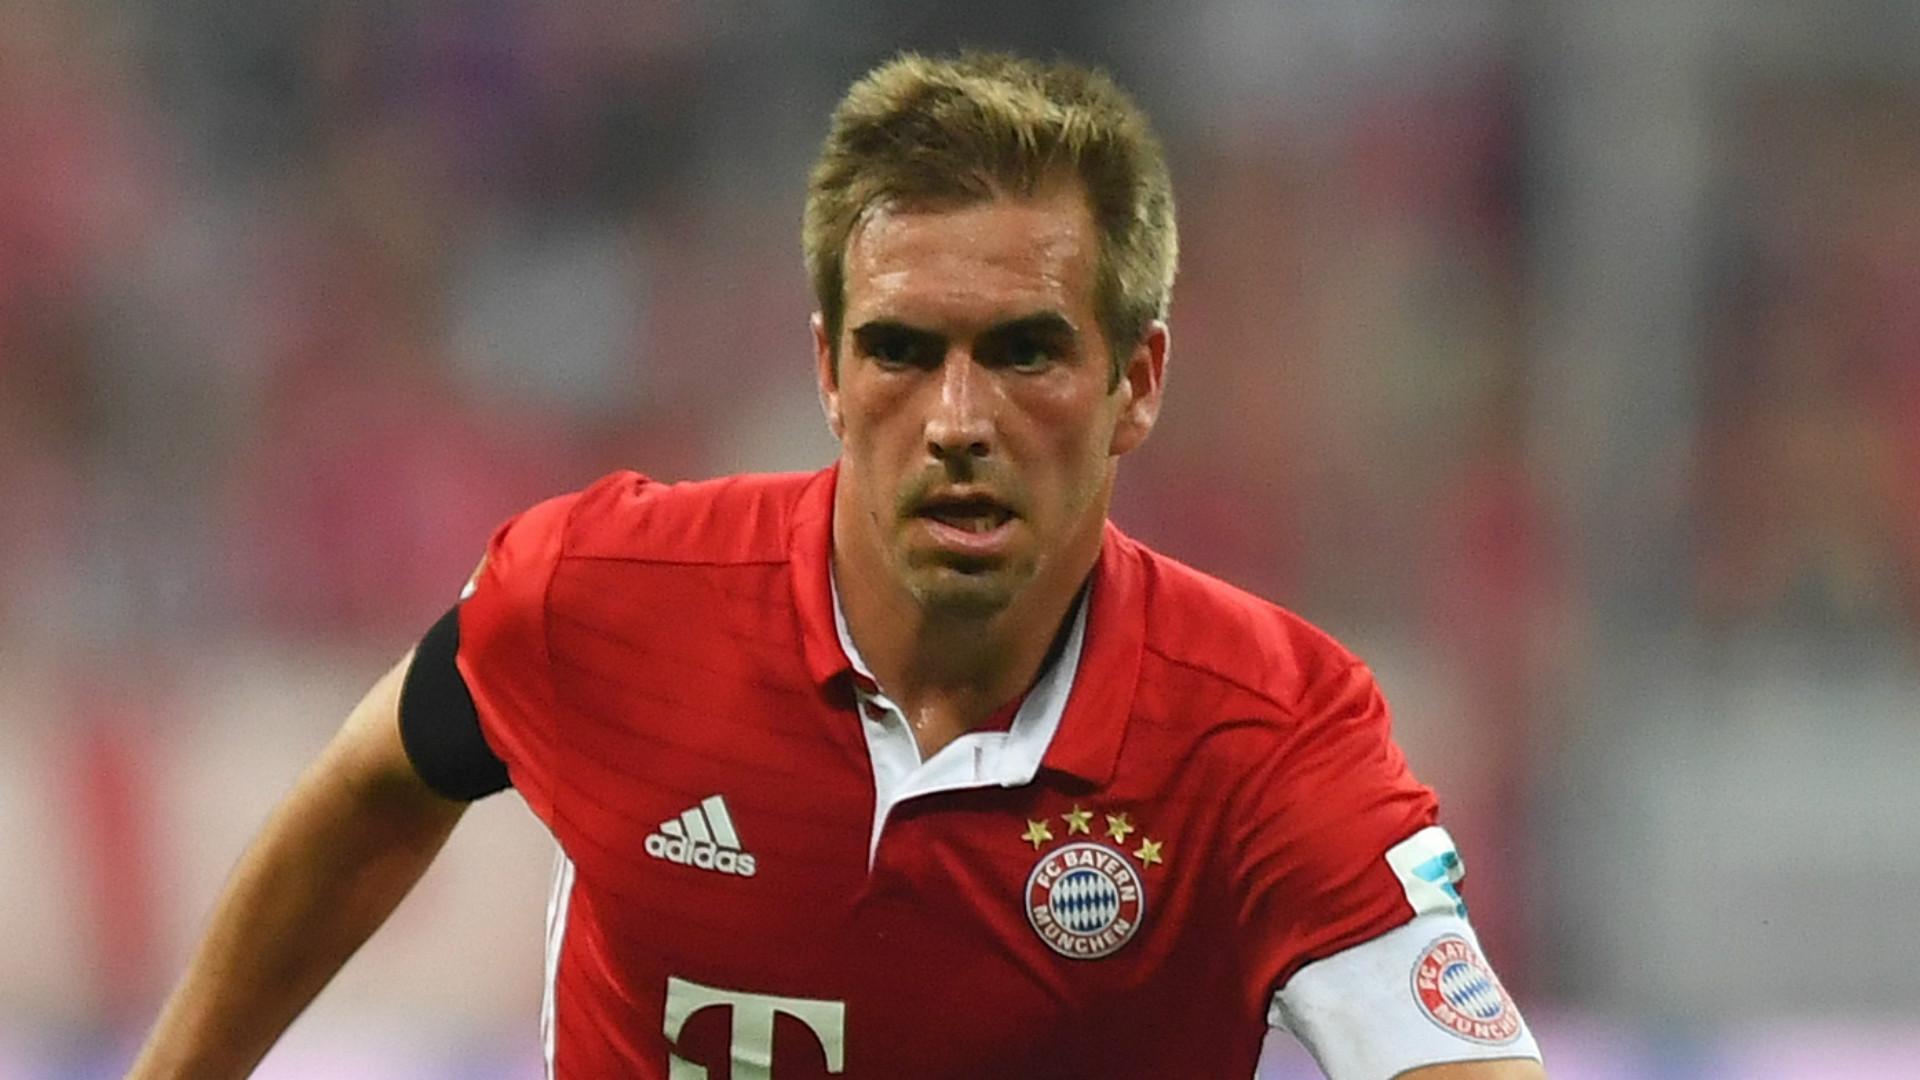 Bayern Carlo Ancelotti wanted Philipp Lahm to play on